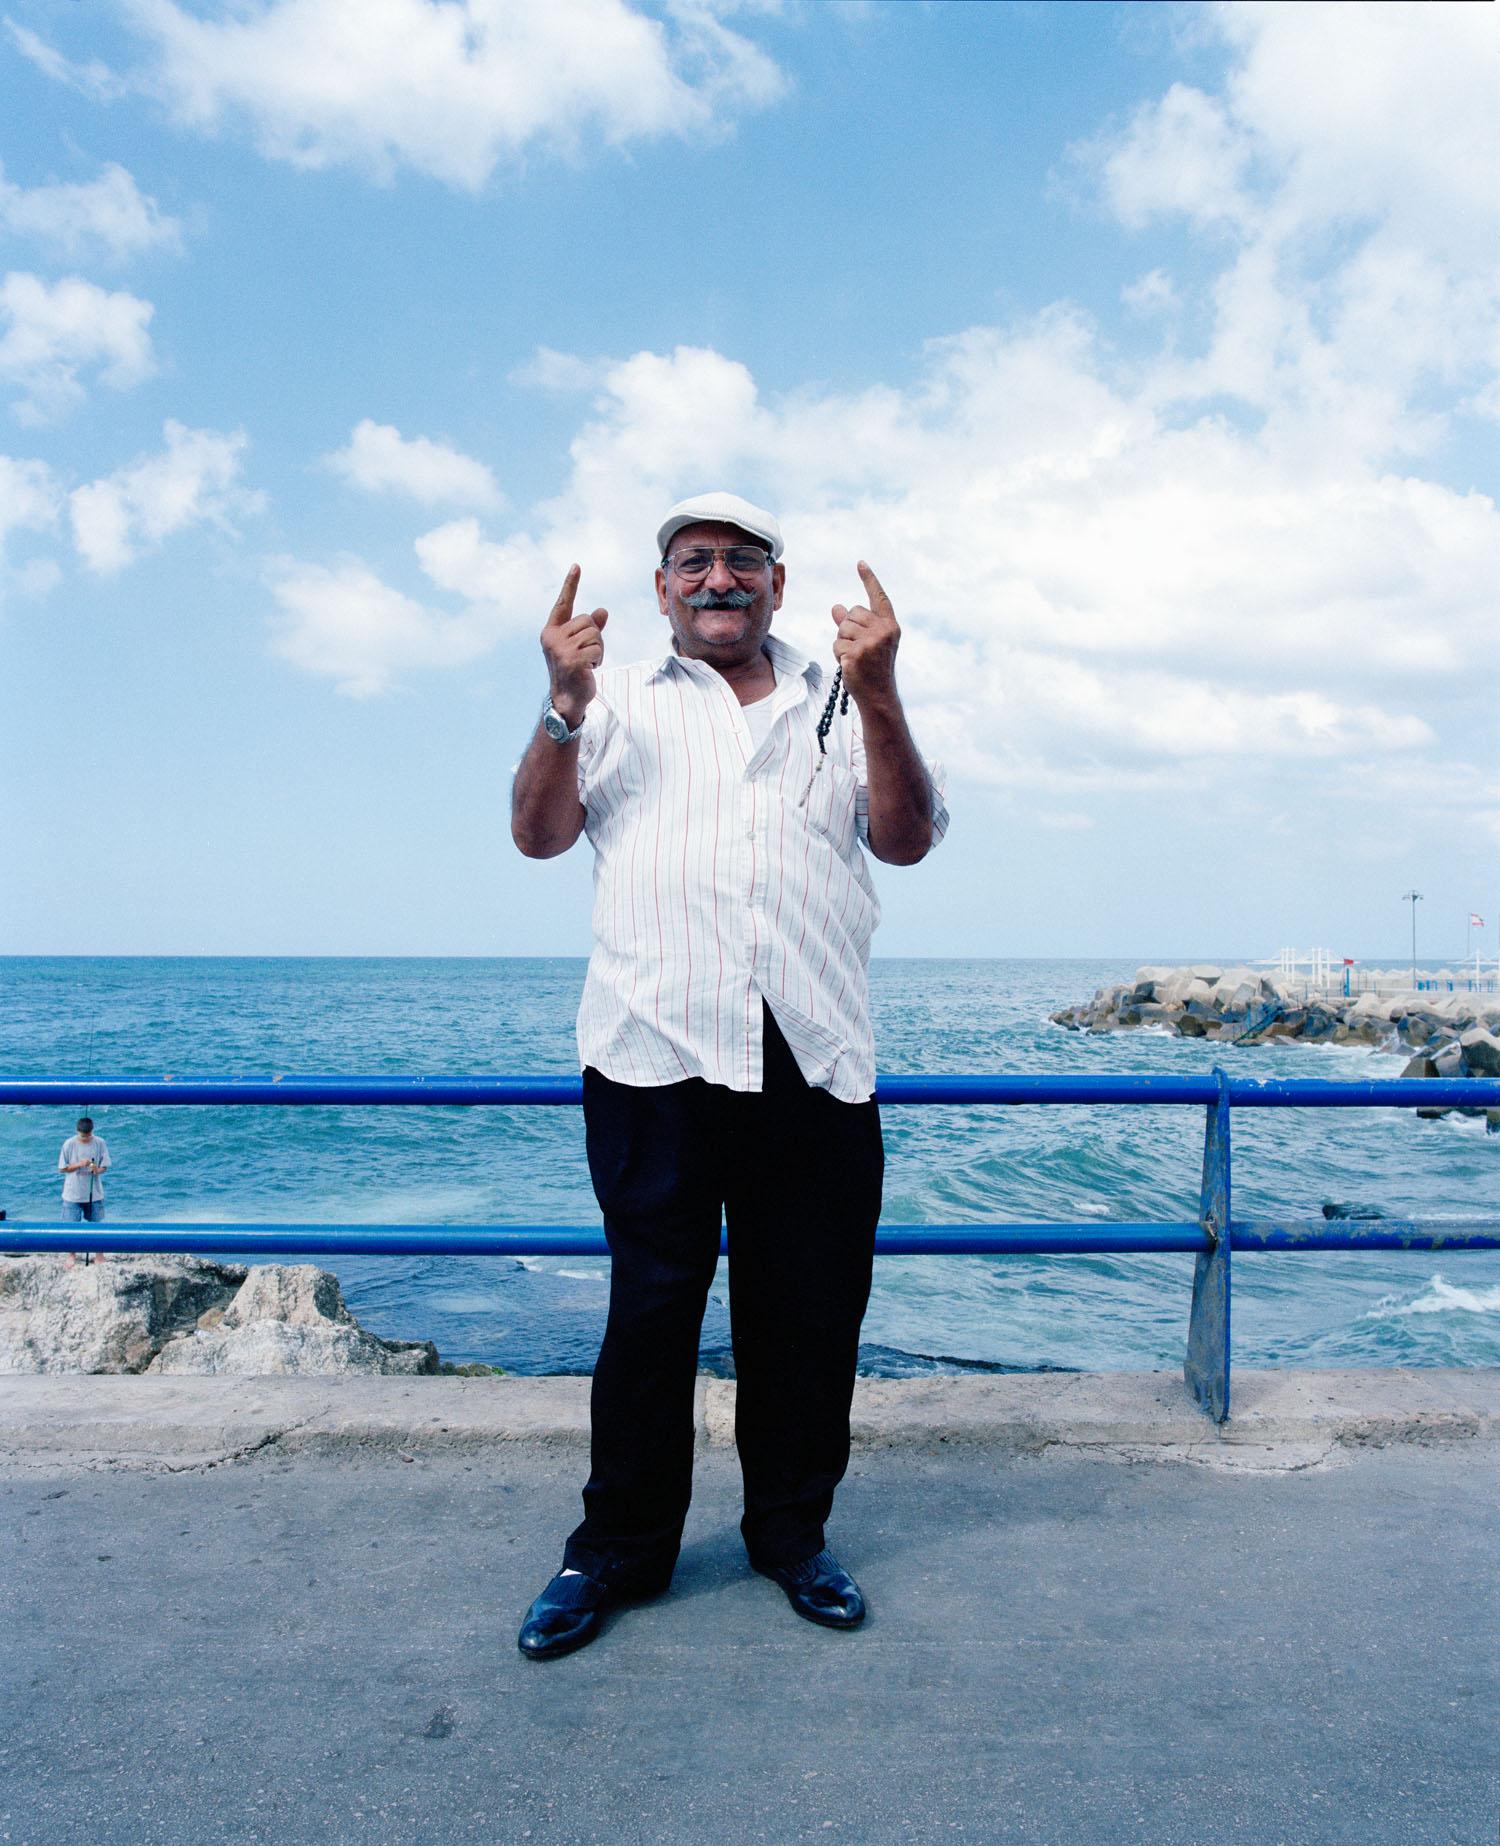 Beirut-blvd-portret-snor.jpg